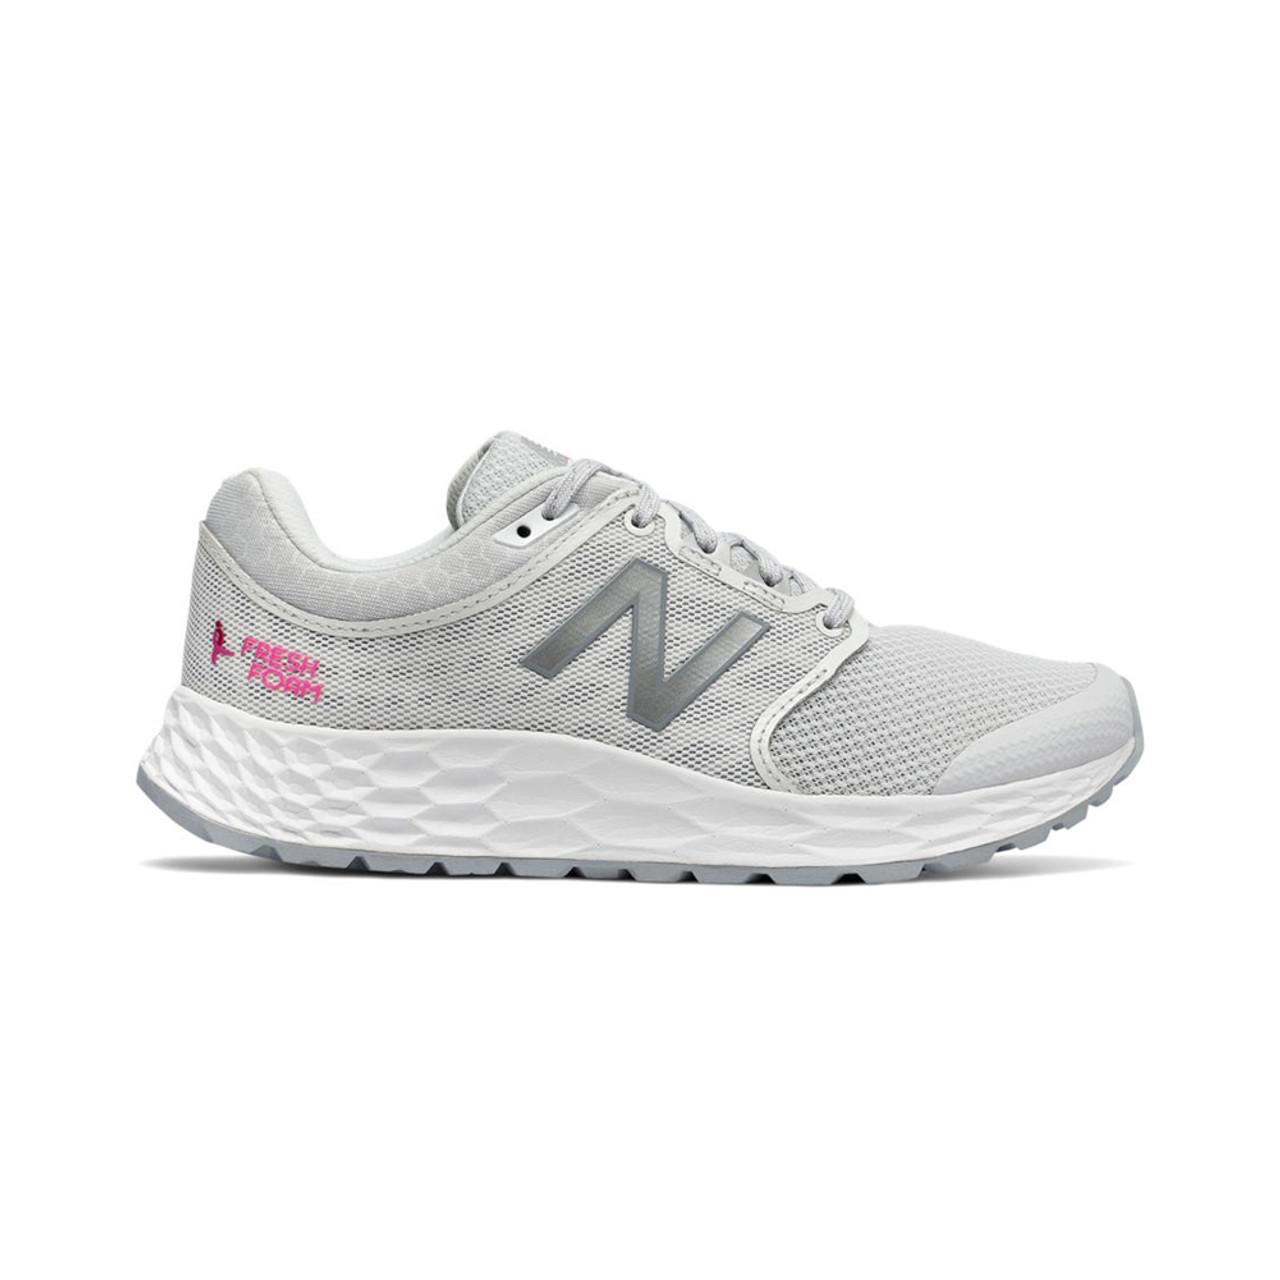 watch f367c 8c3a0 New Balance Women's WW1165KM Walking Shoe White/Pink Glo